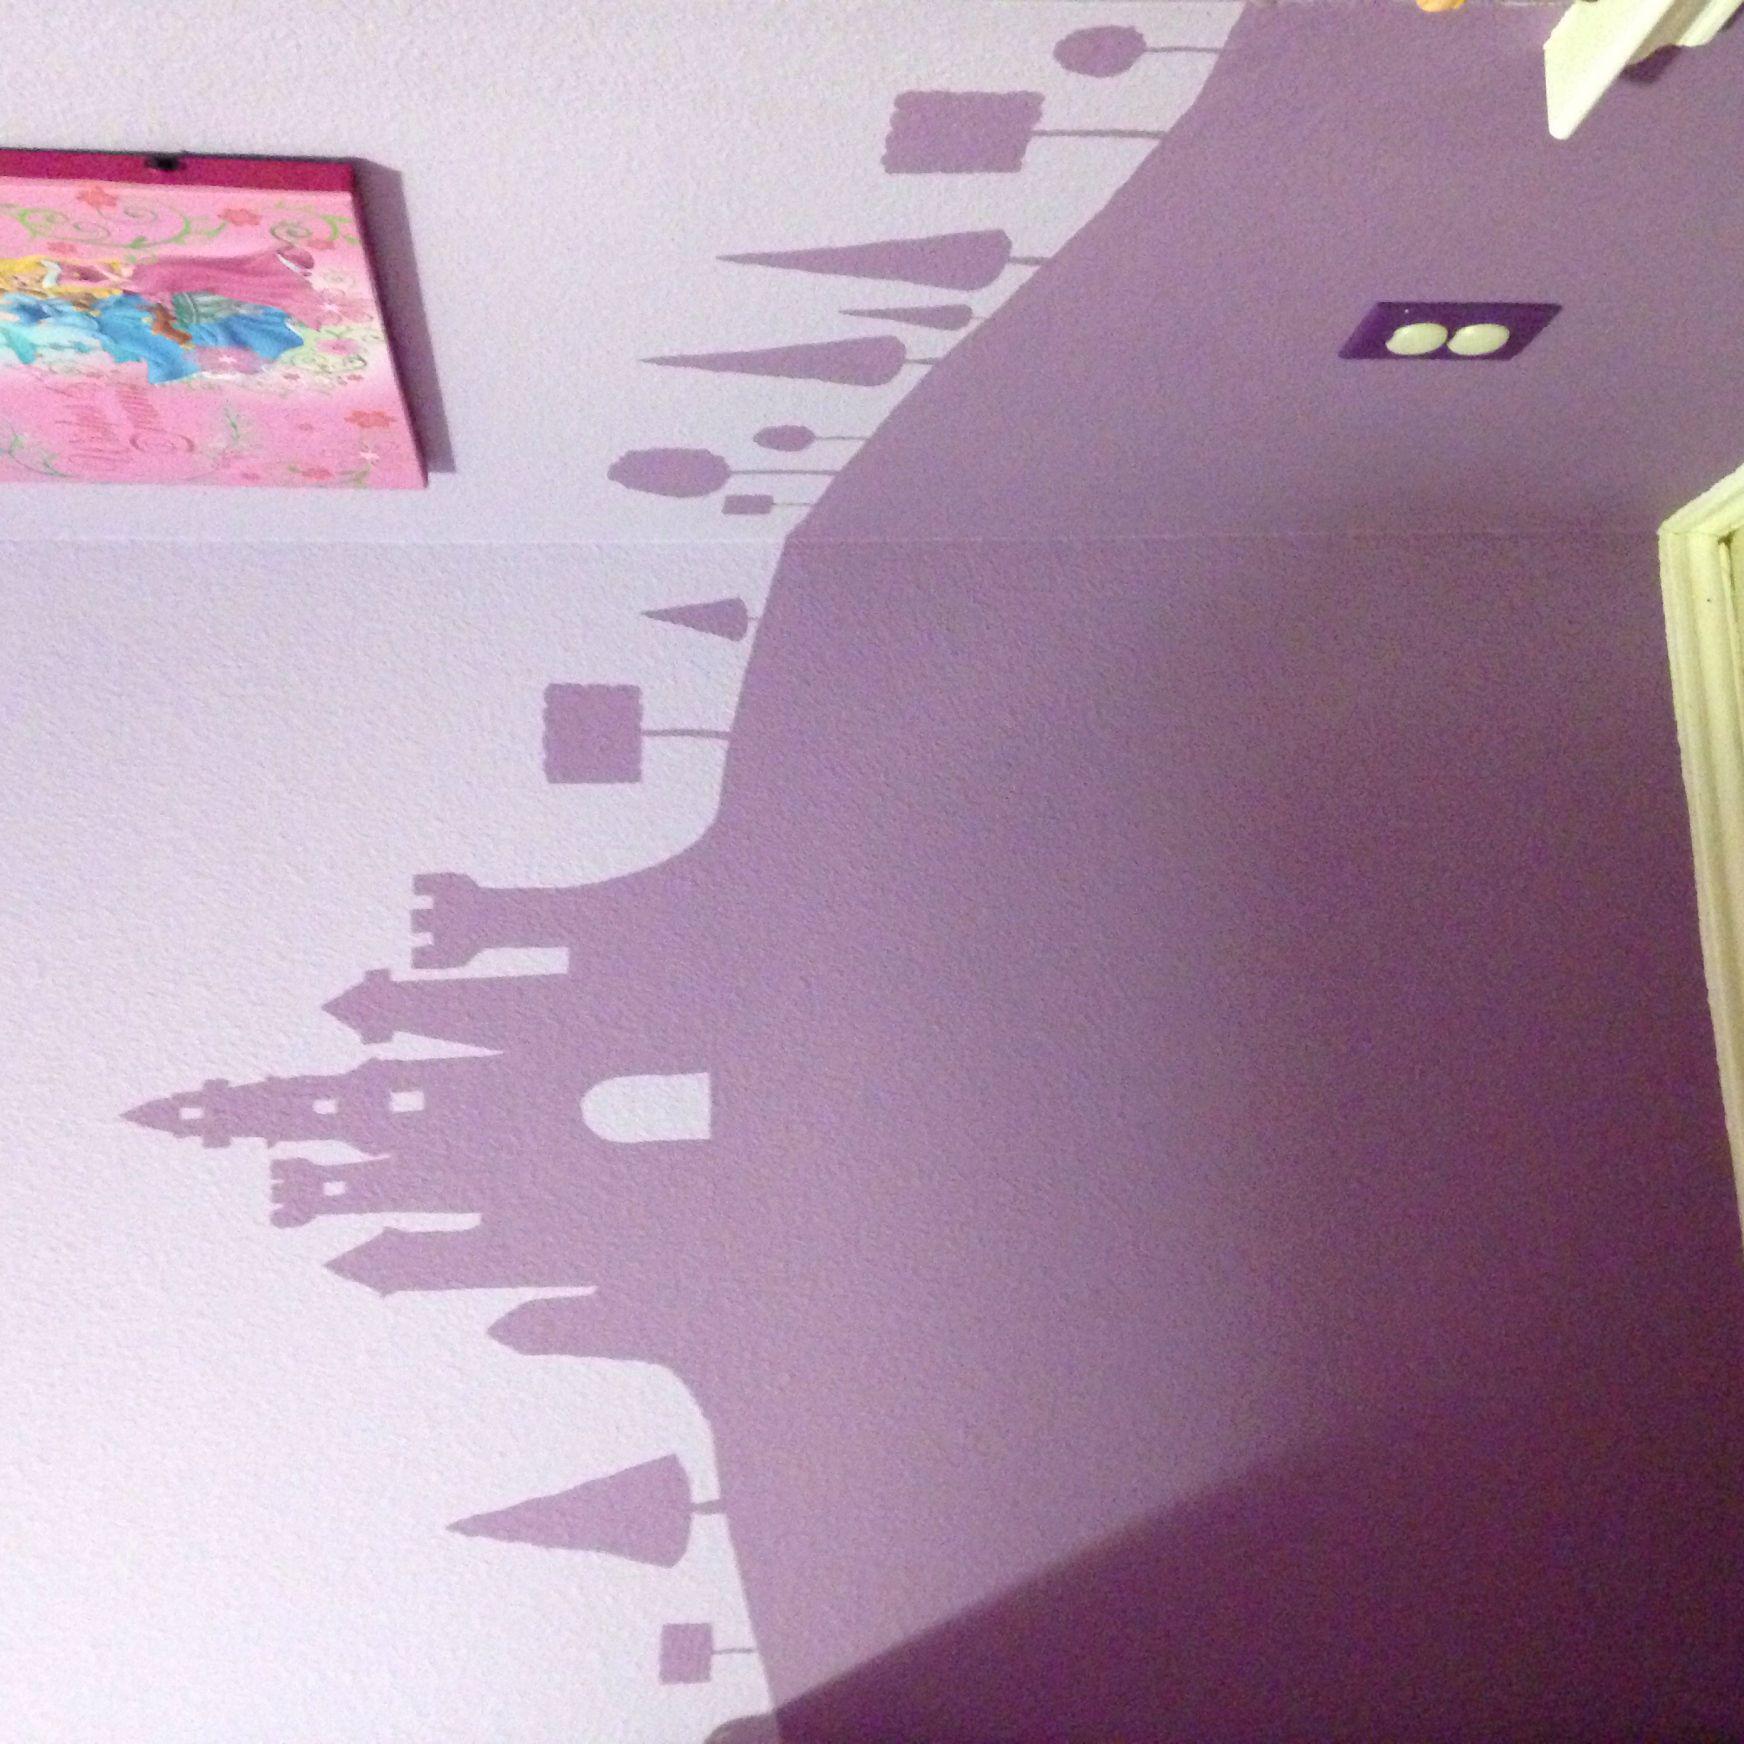 Wall painting stencils kids rooms  disney wall stencils for painting kids rooms  photos of